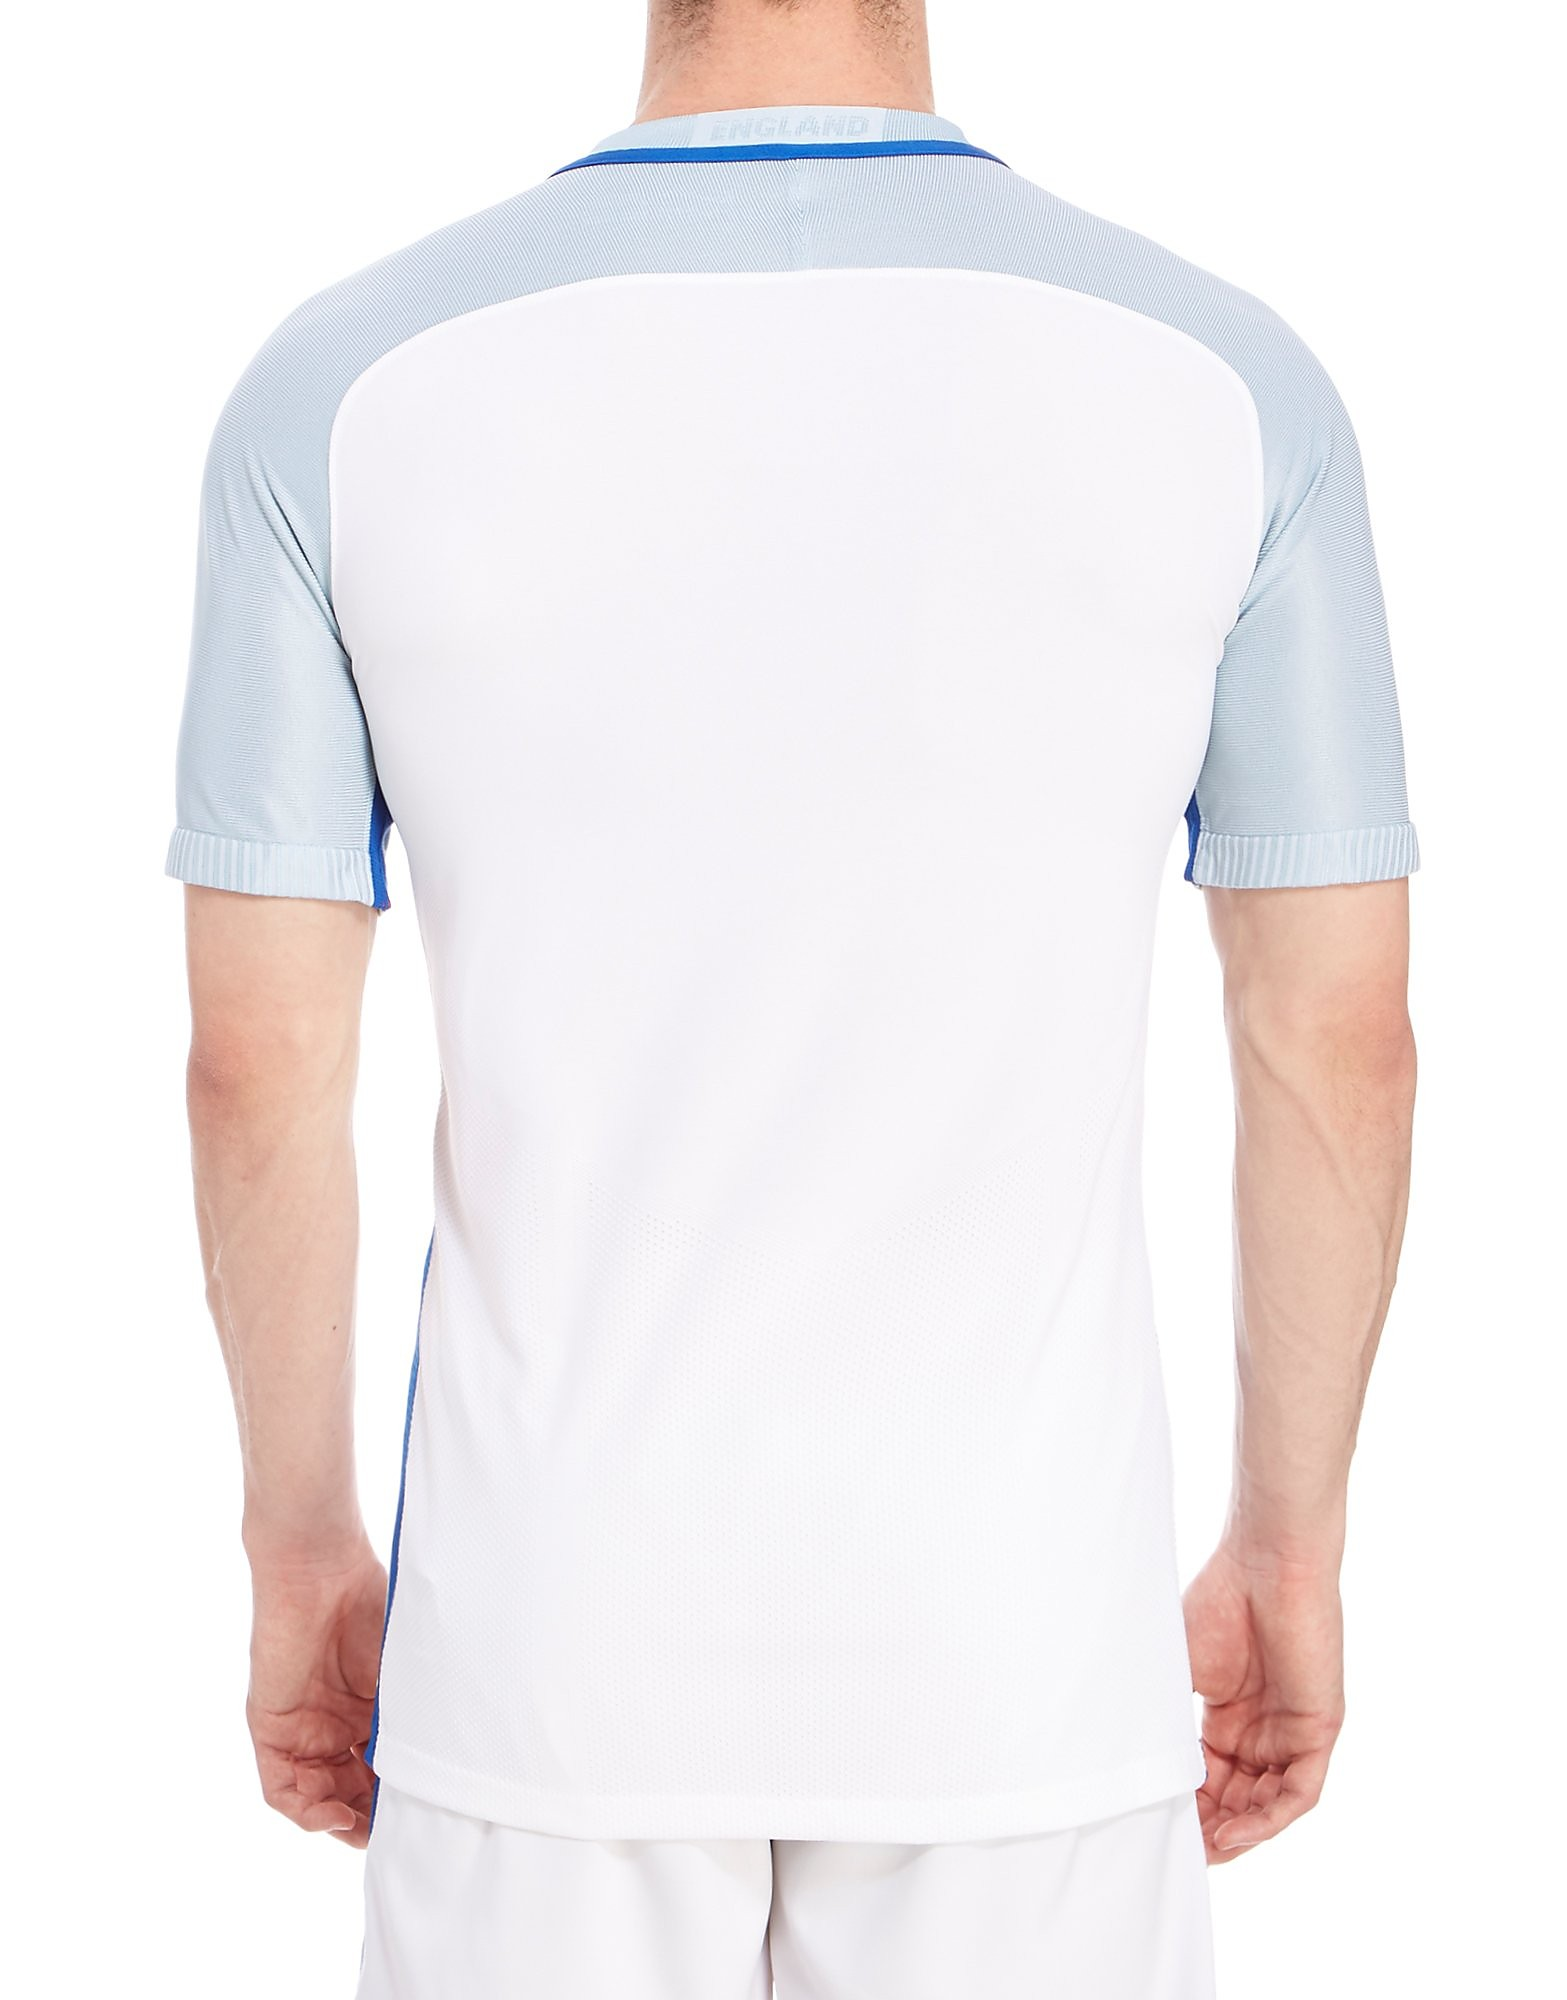 Nike England 2016 Home Match Shirt